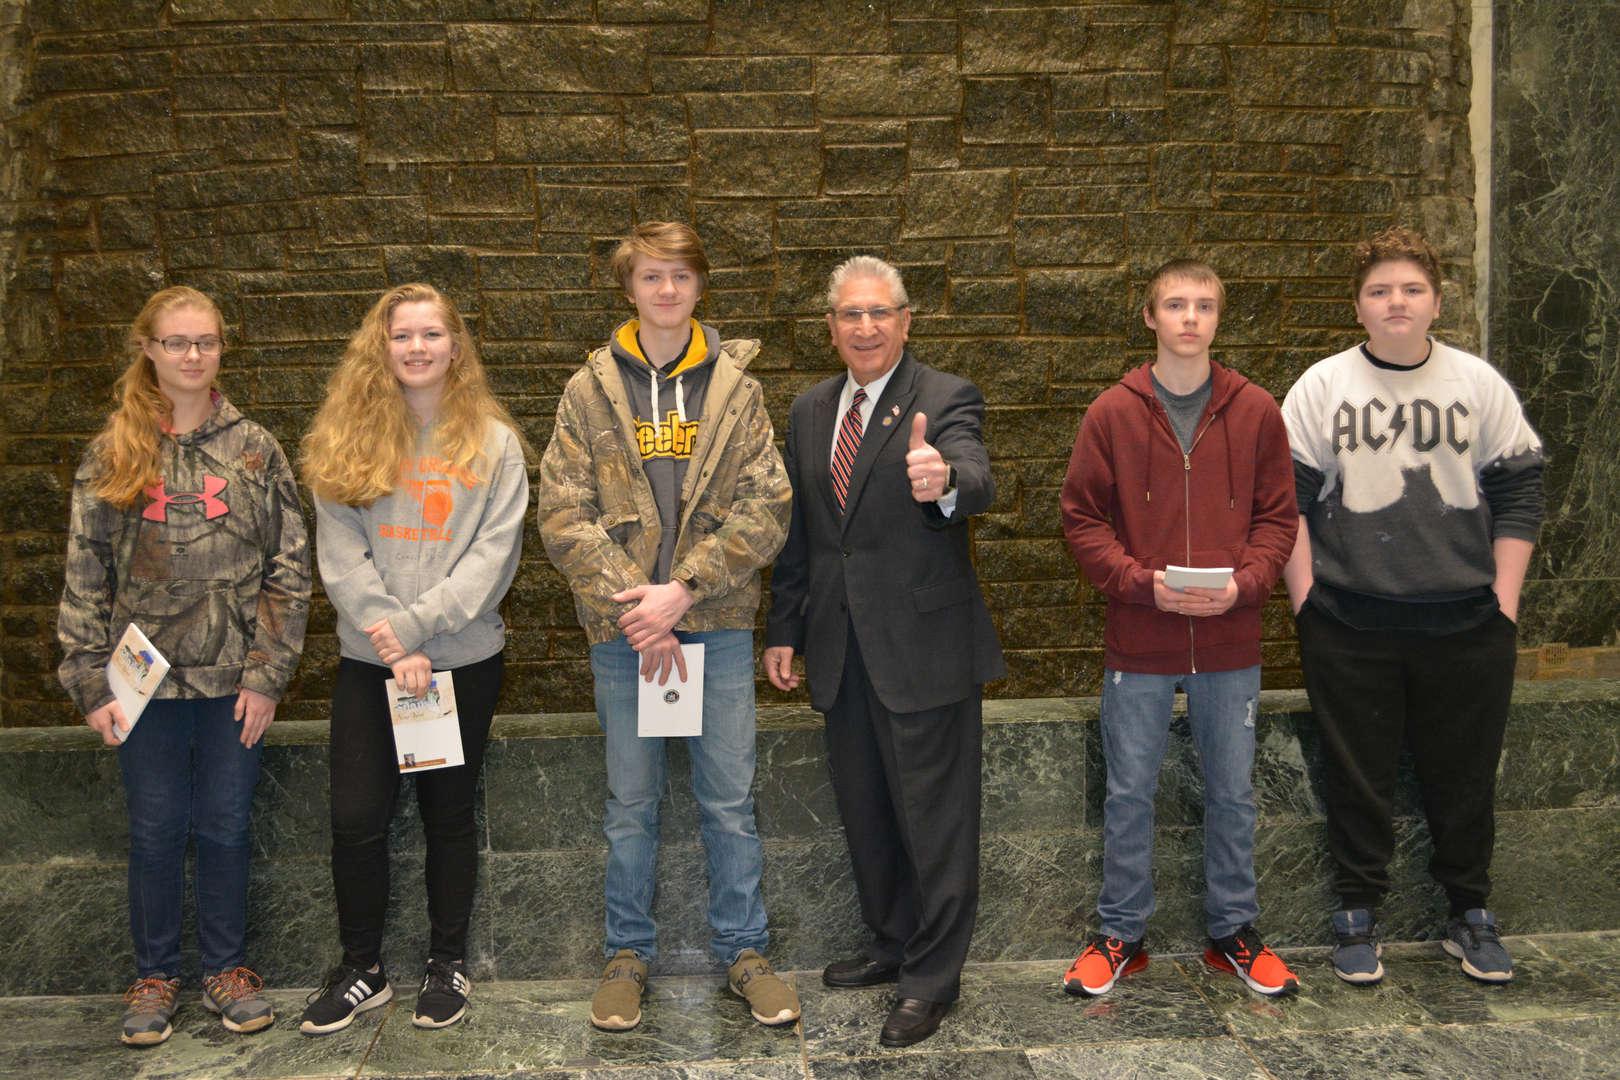 Students with Senator Tedisco